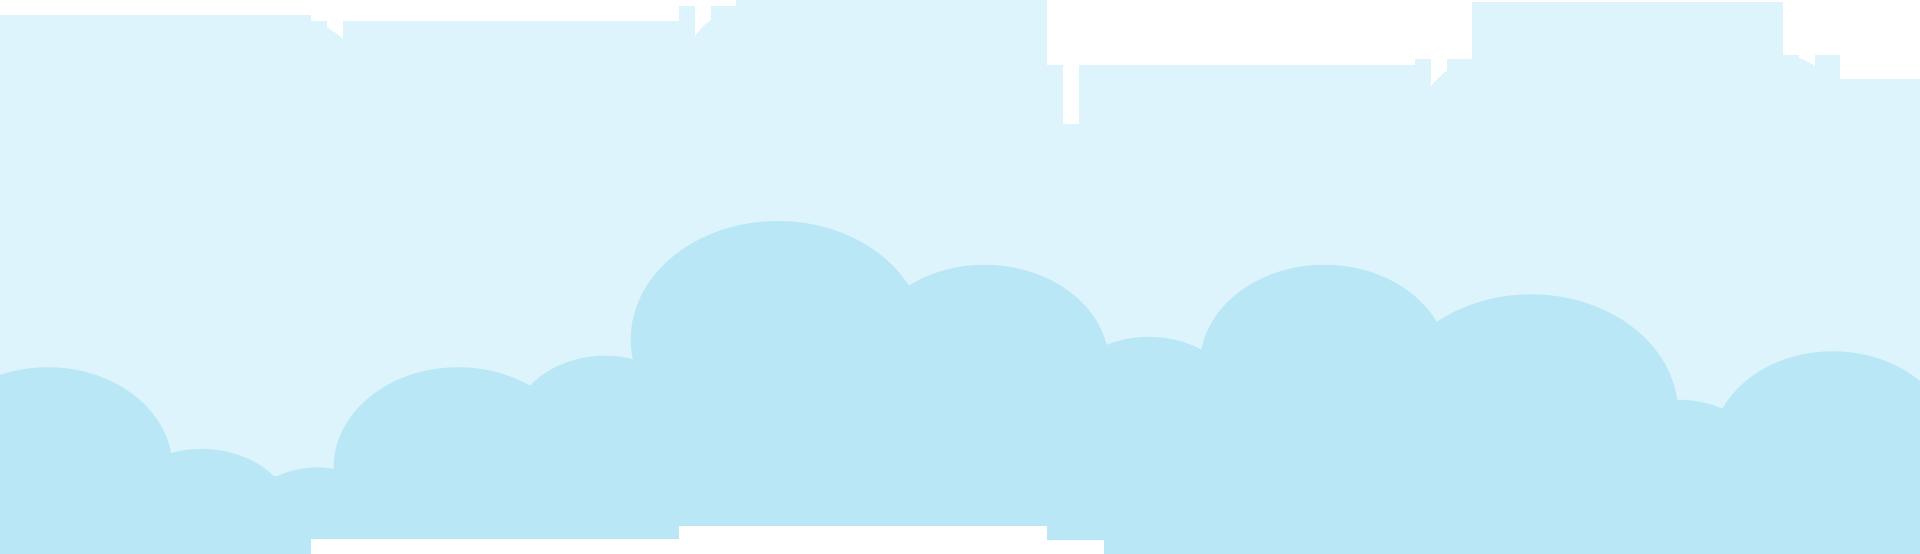 clouds-flowerpotsdaynurseryhomepage